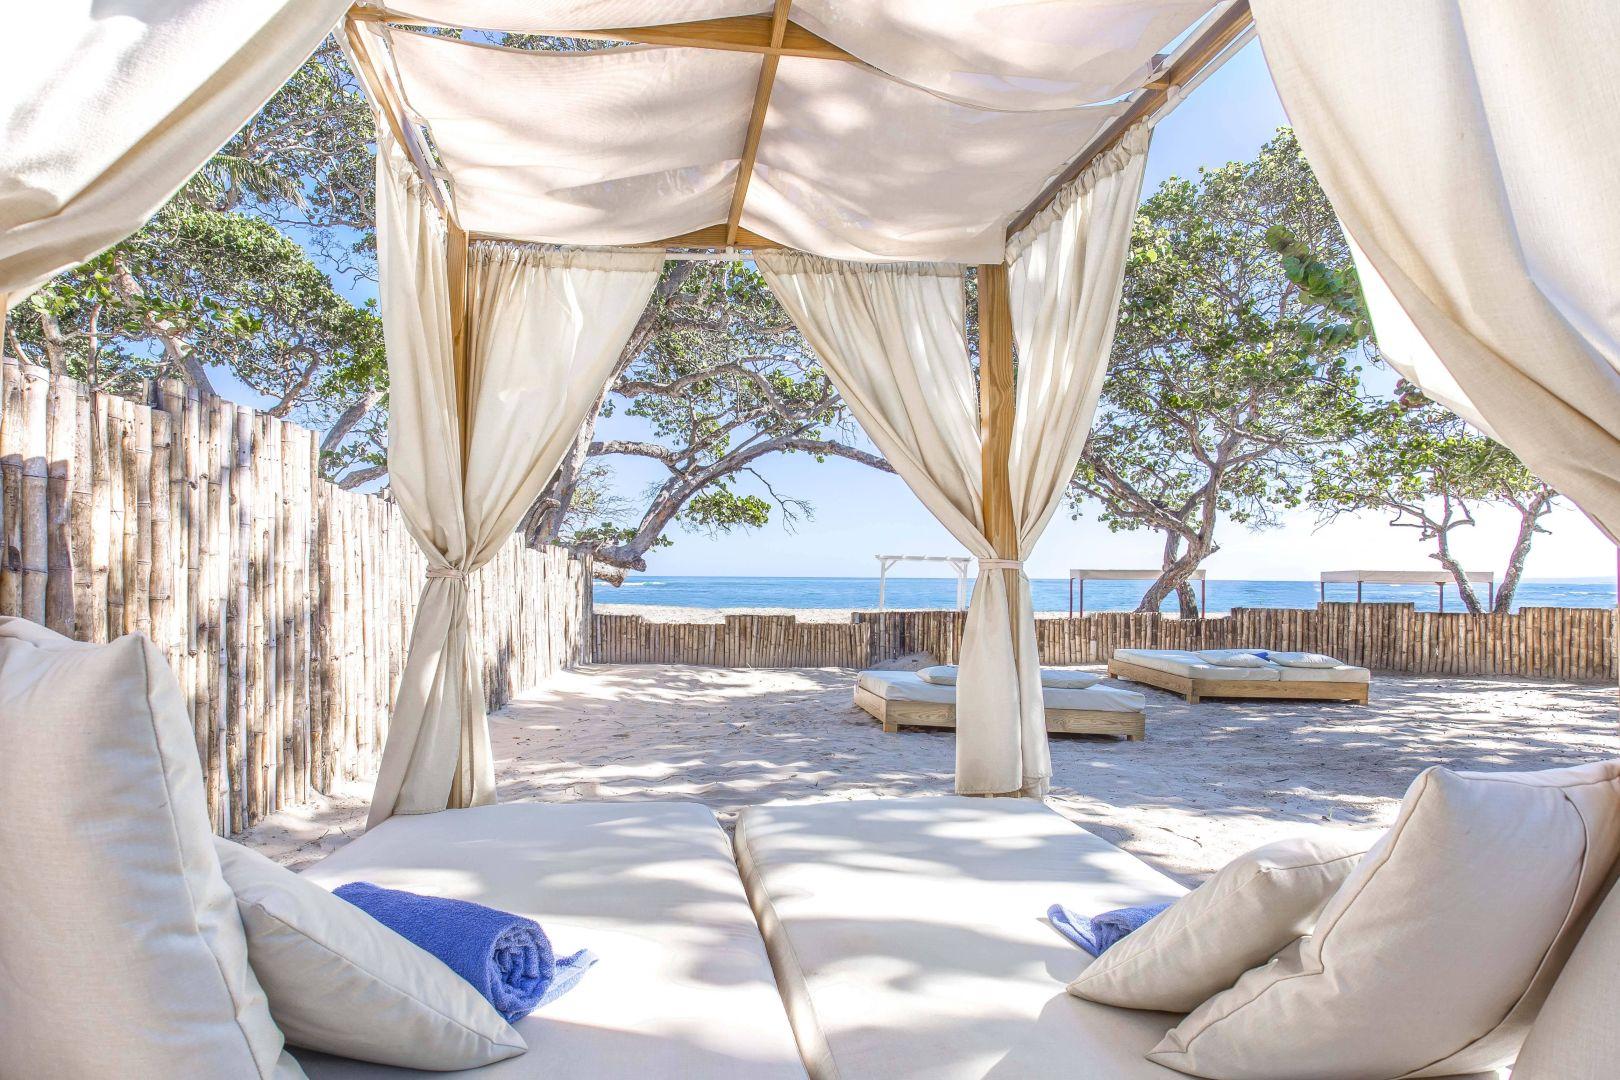 11 Tage Dominikanische Republik im 4,5* Hotel mit All In, Flug, Rail&Fly u. Transfer ab 940€